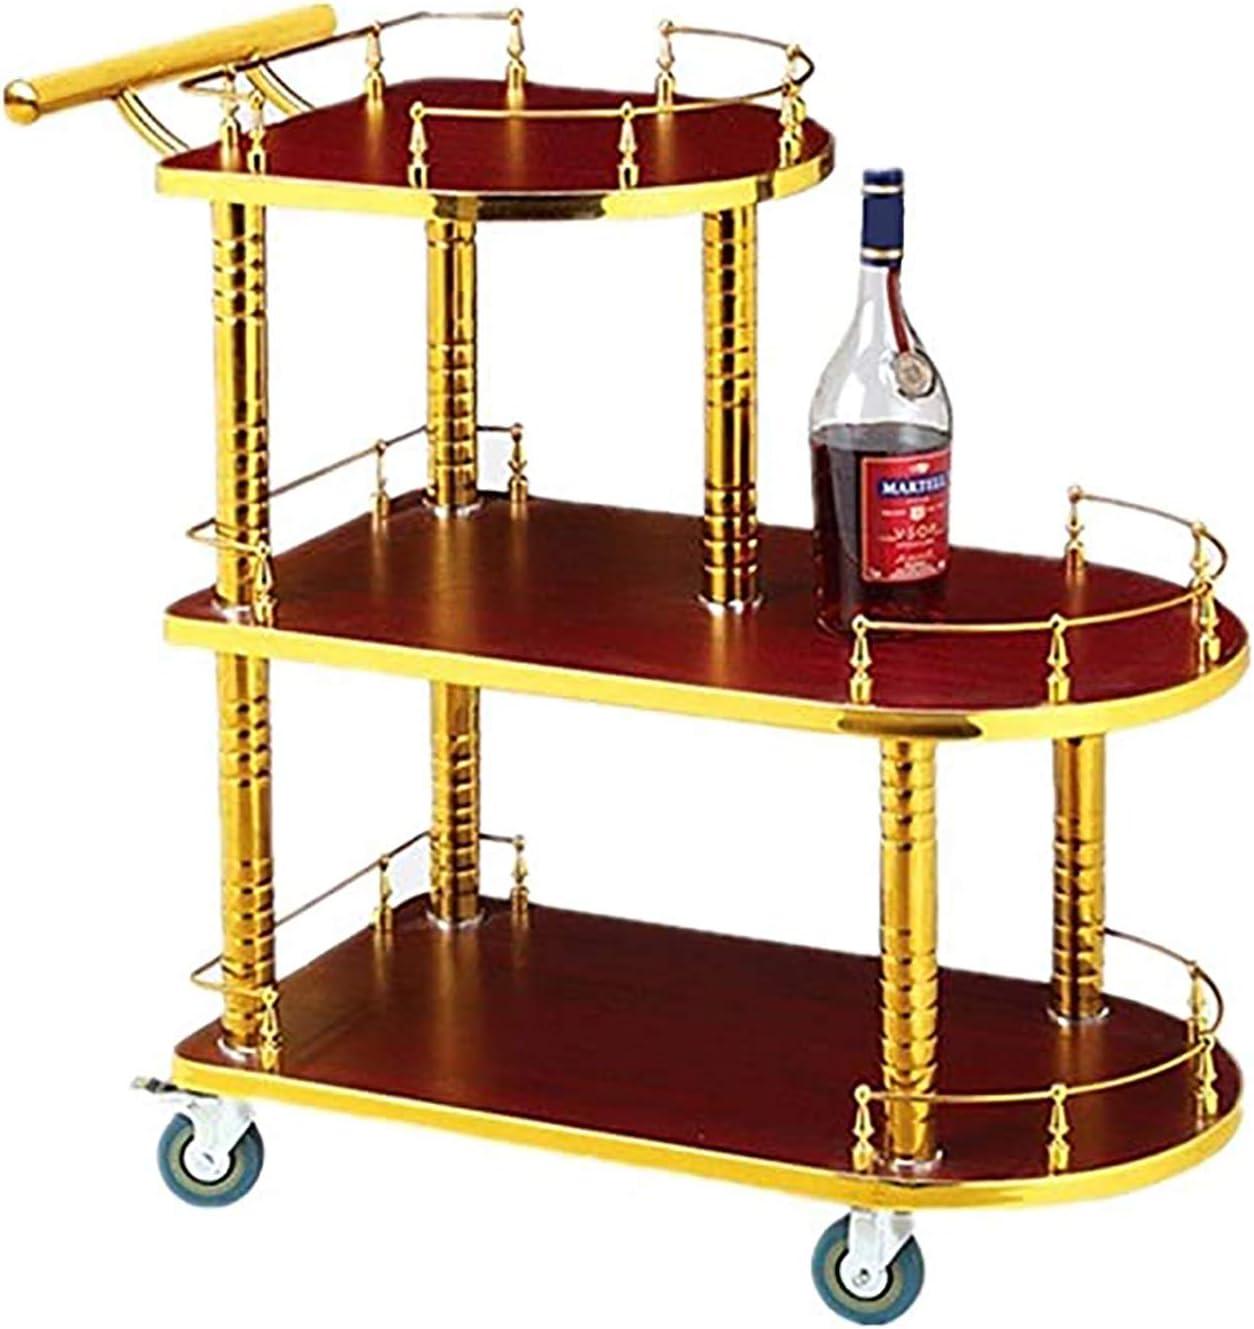 OMKMNOE Simple Idea Trolley Racks, Carrier De Vino Snack Coche Carrito De Té Móvil Hotel Carriage Bank Trolley Beauty Herramienta Carrito Práctico,Rojo